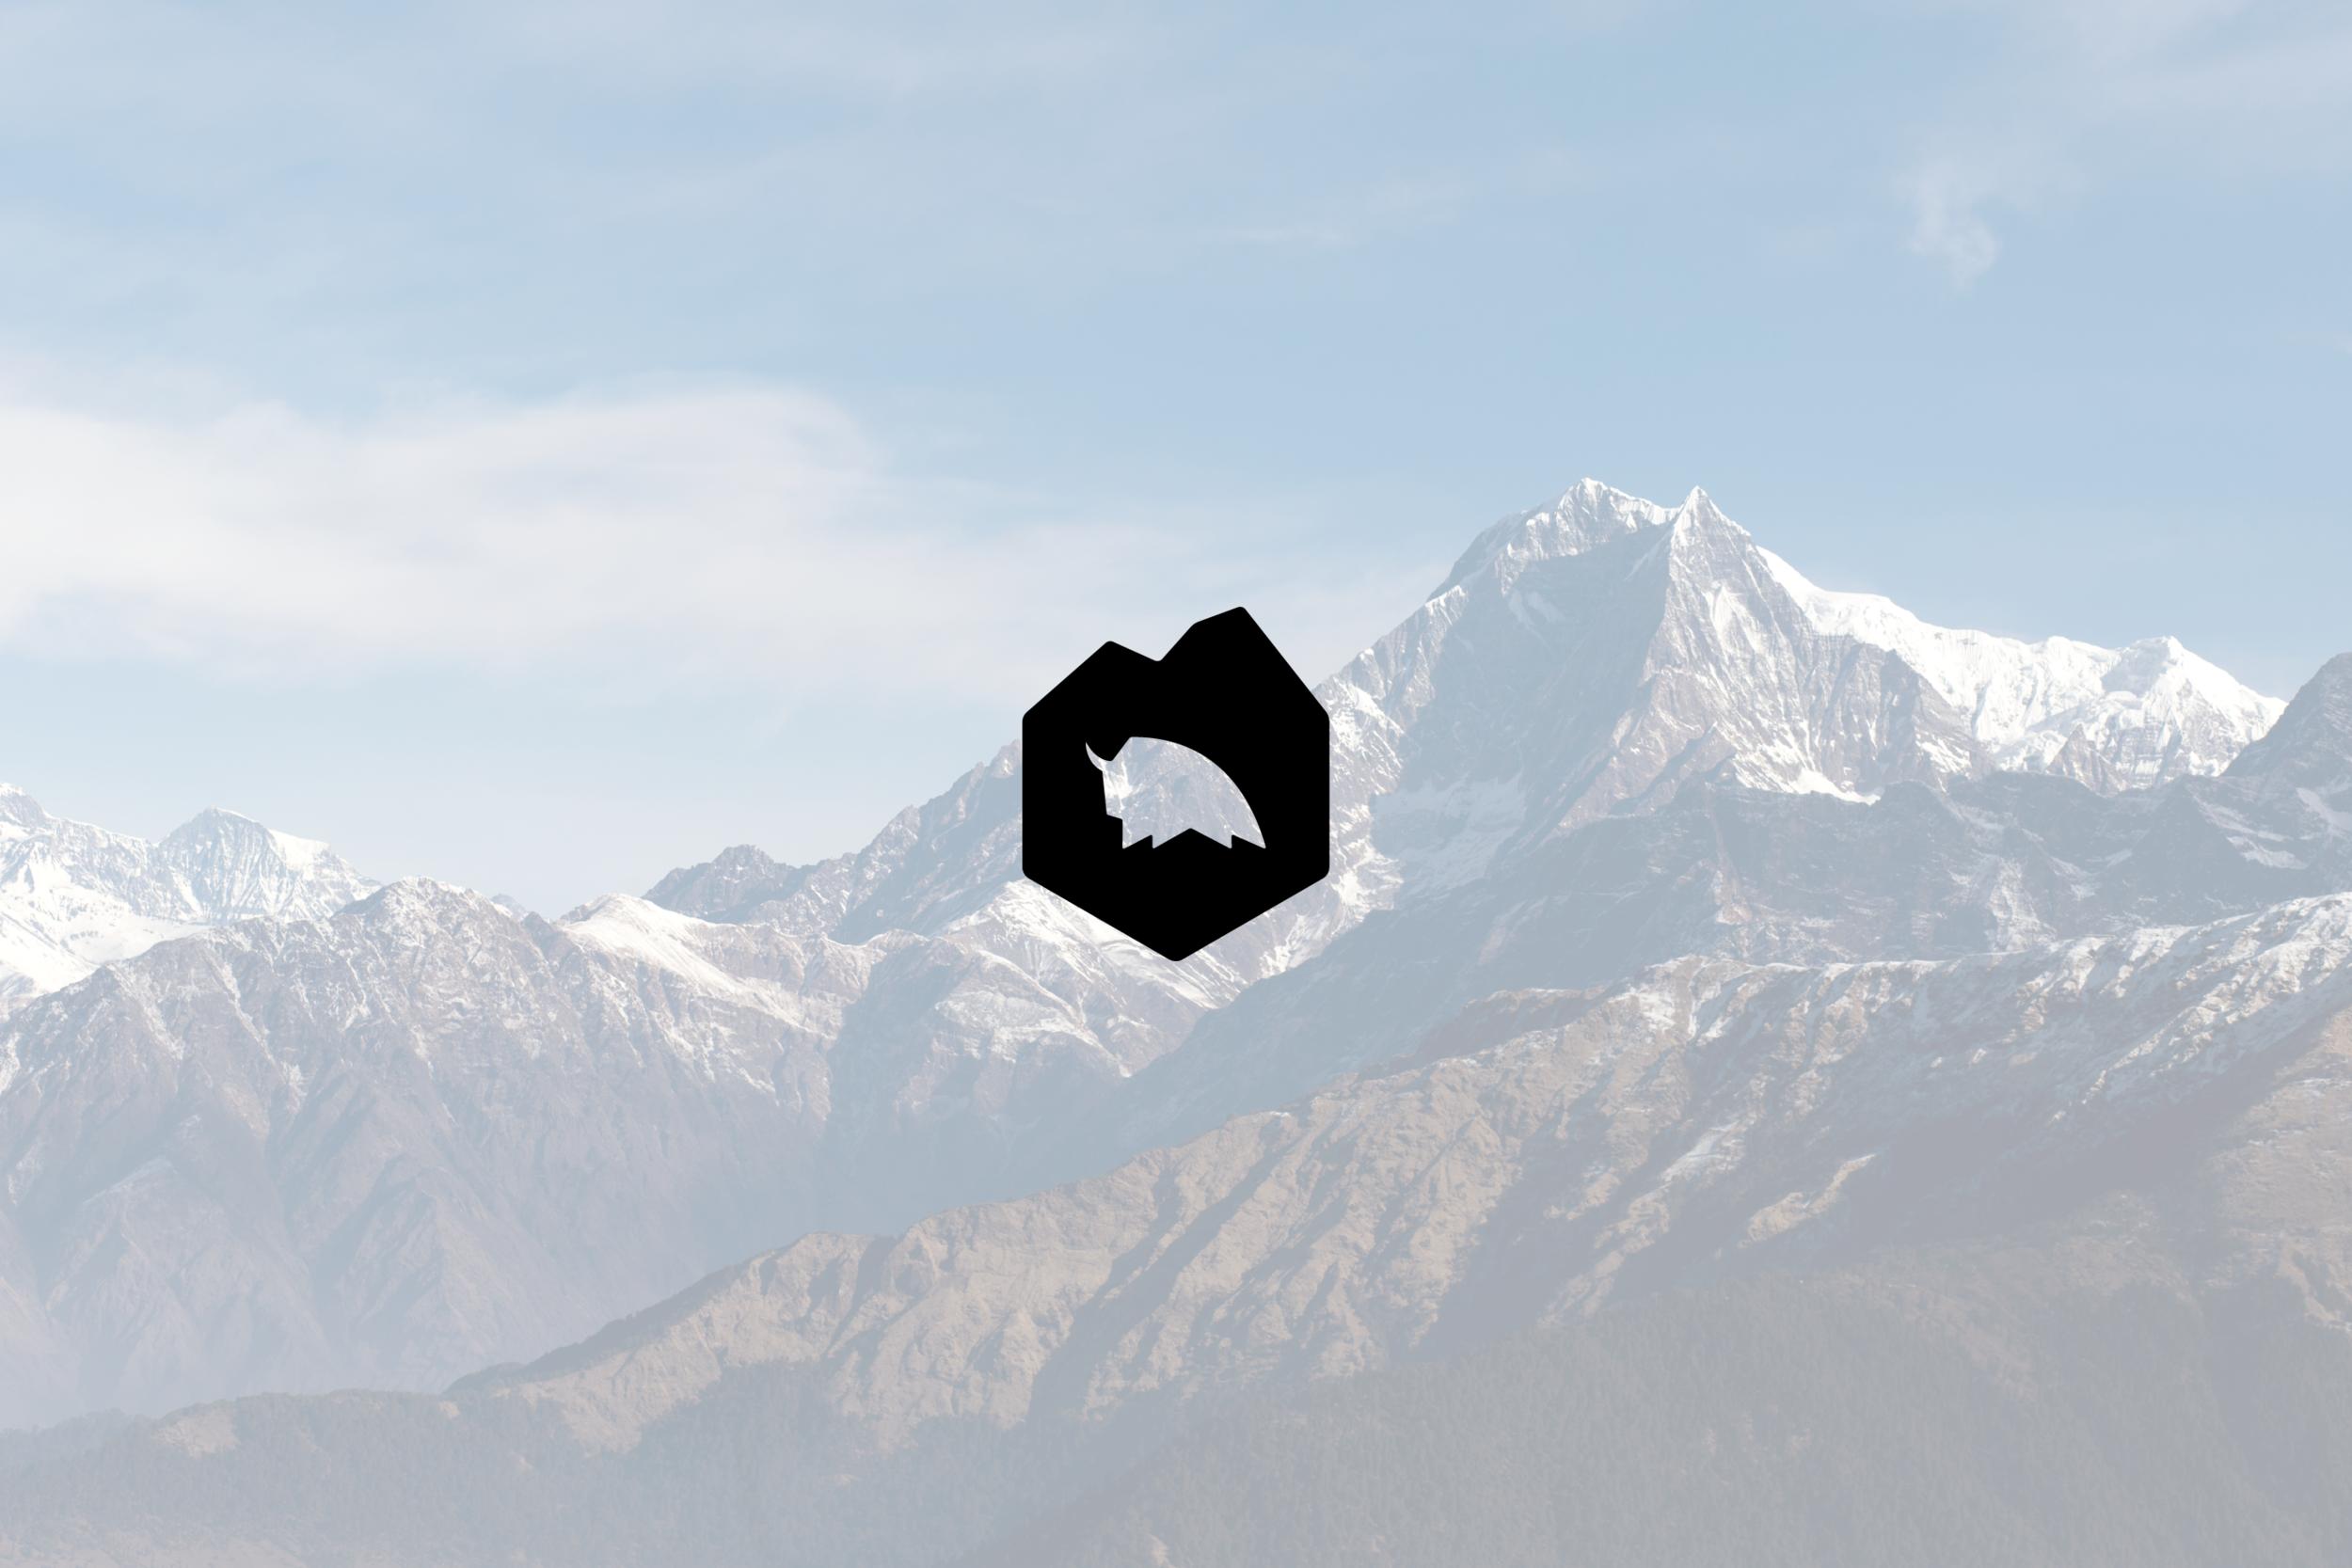 Logo design for Studio Dzo, design & branding studio in Austin, Texas.